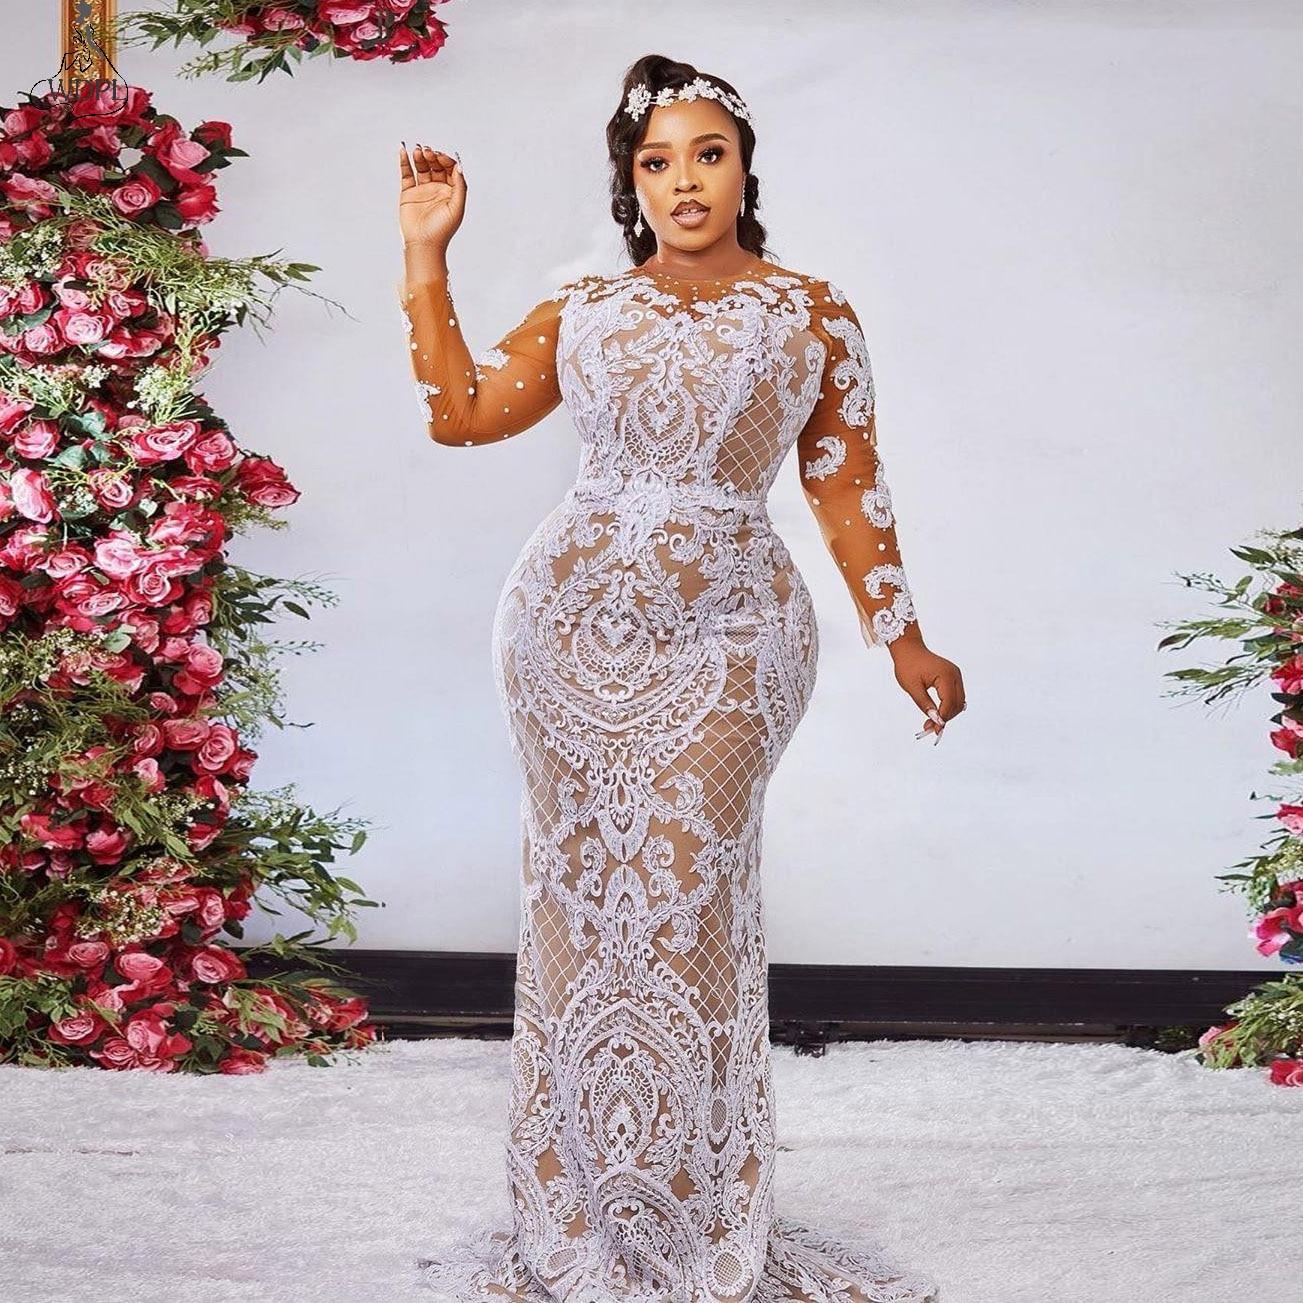 Promo Black Girl Mermaid Wedding Dress 2021 African Wedding Gowns Lace Applique Bridal Formal Party Dresses Plus Size vestido de noiva